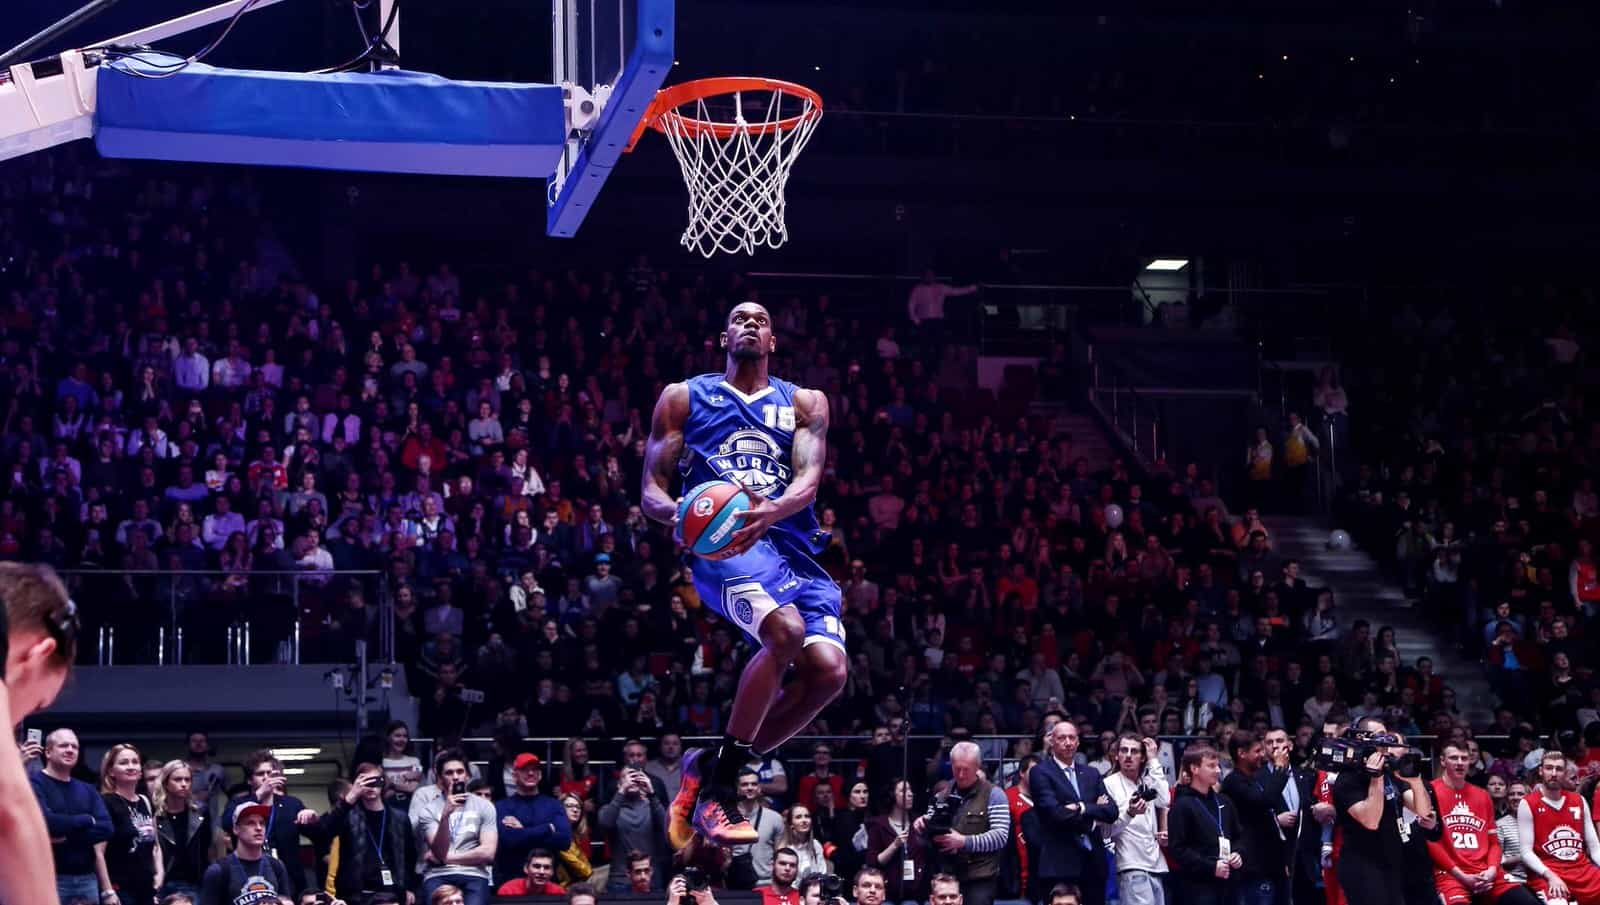 Матч всех звёзд баскетбол 2019 в ВТБ Арена